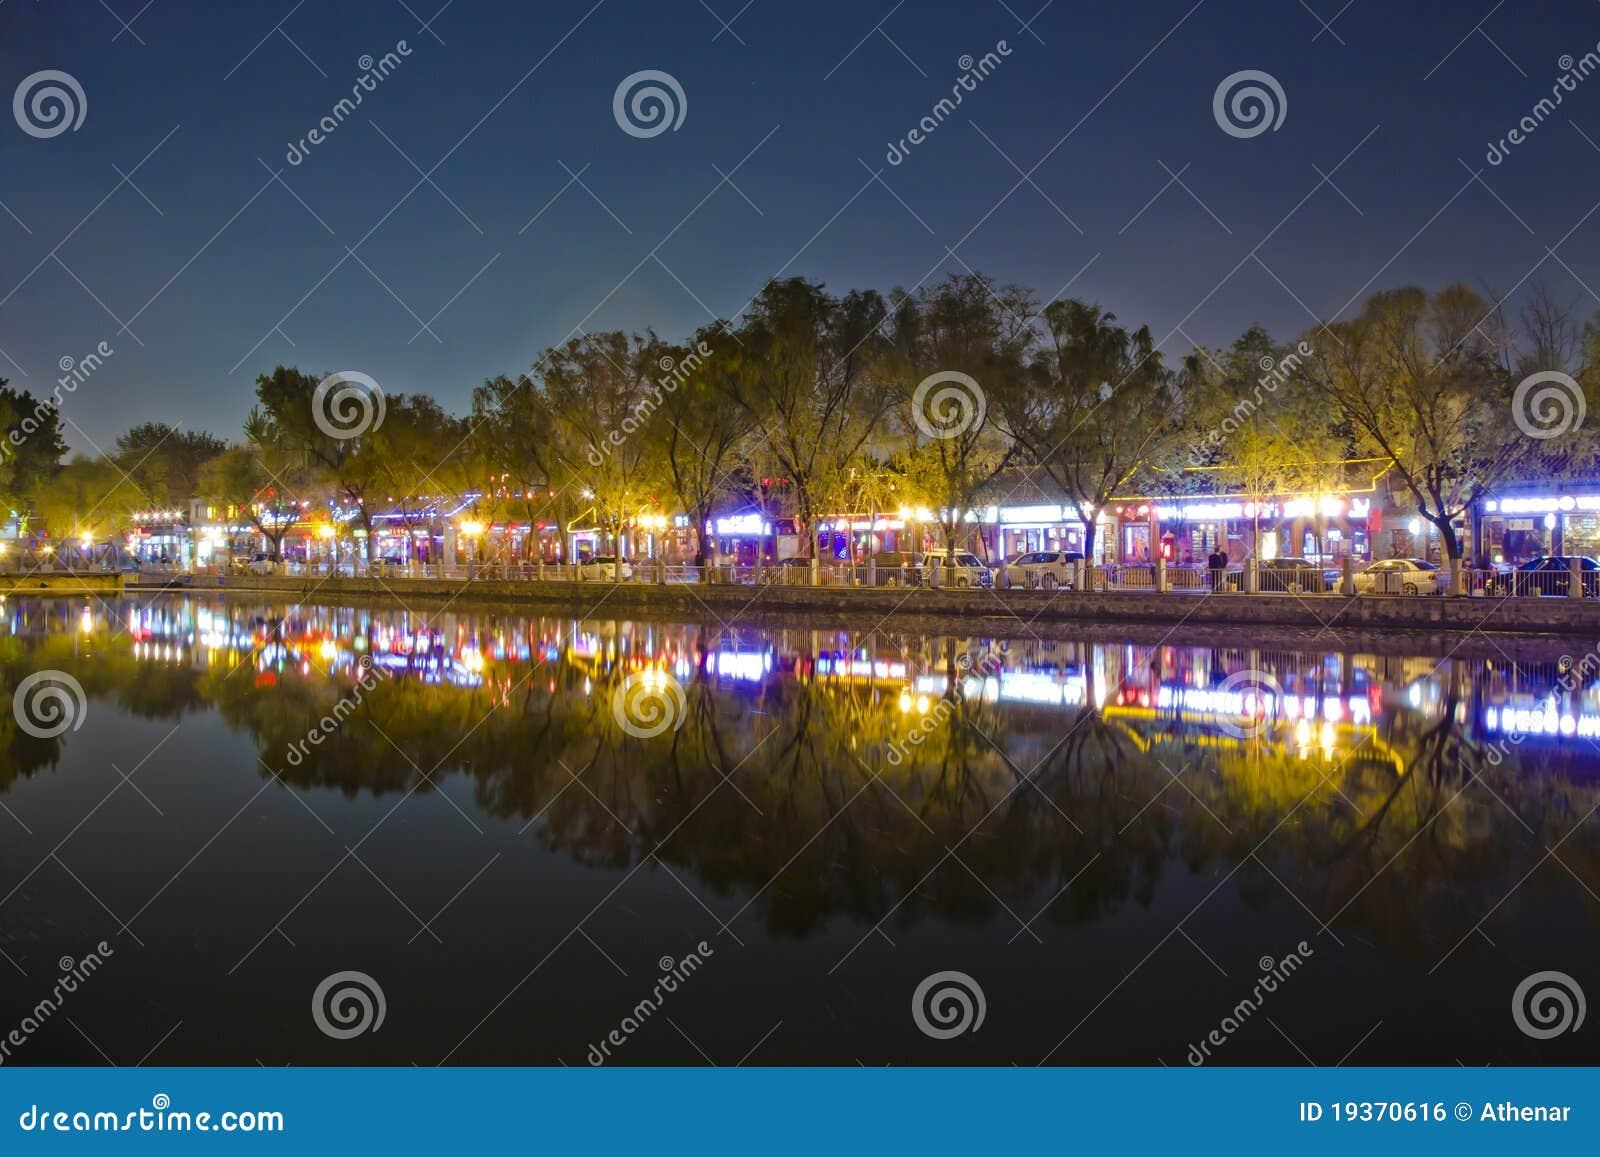 Night scene of lake reflection in Beijing Houhai